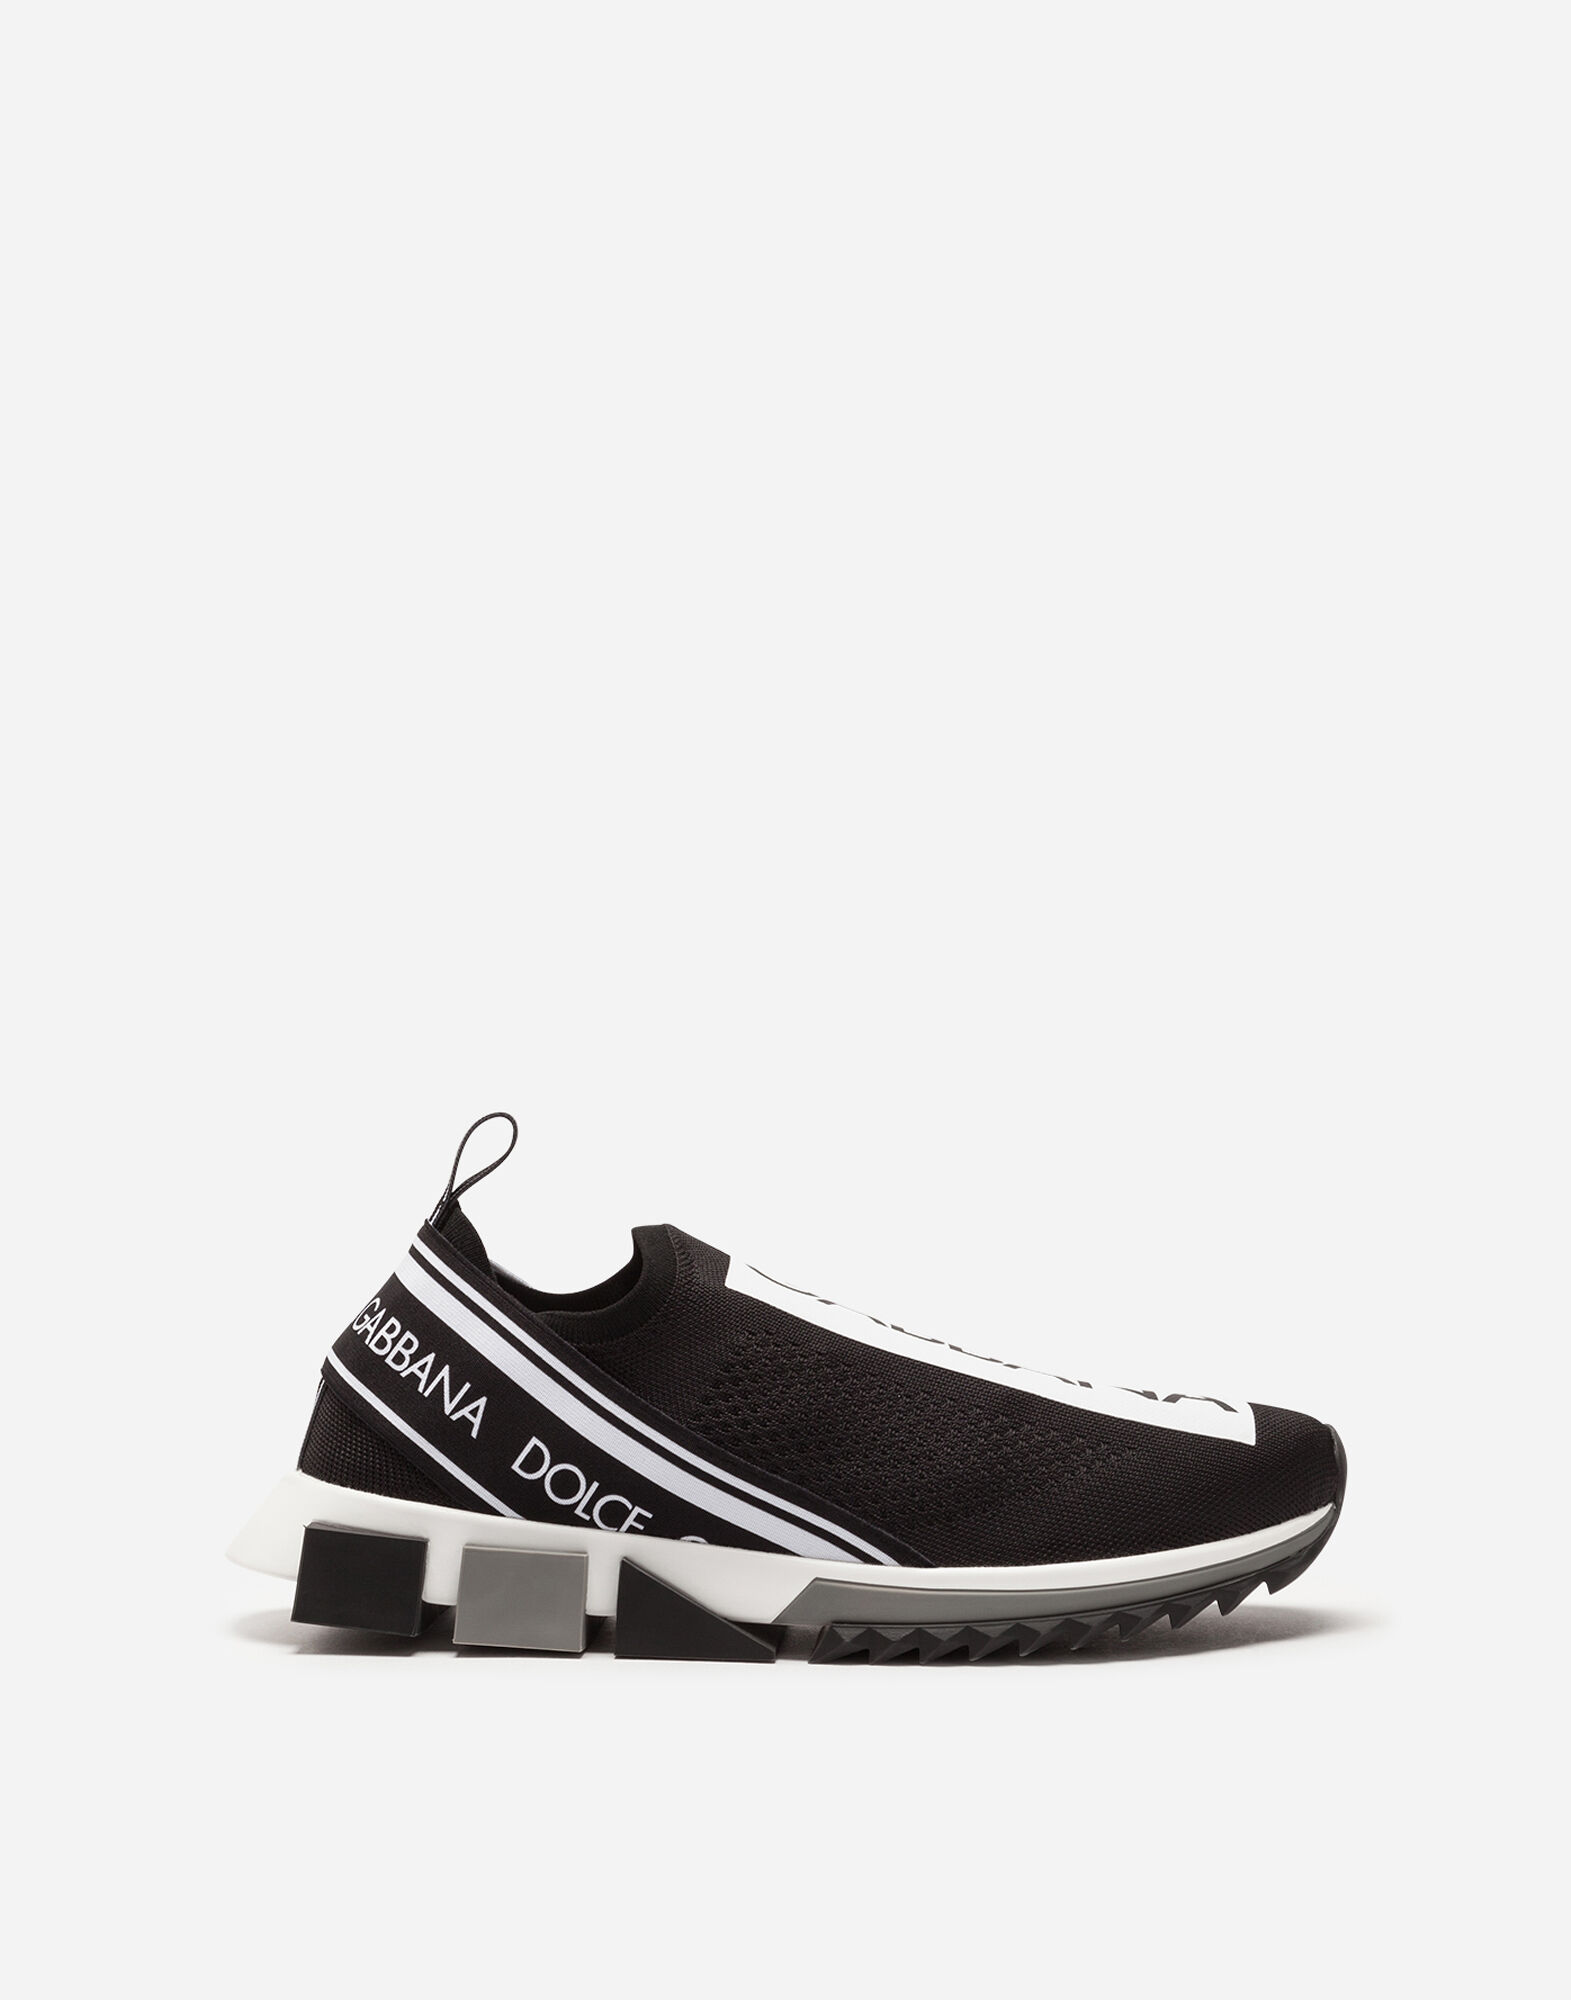 Sorrento Sneakers Men's Shoes | Dolce&Gabbana